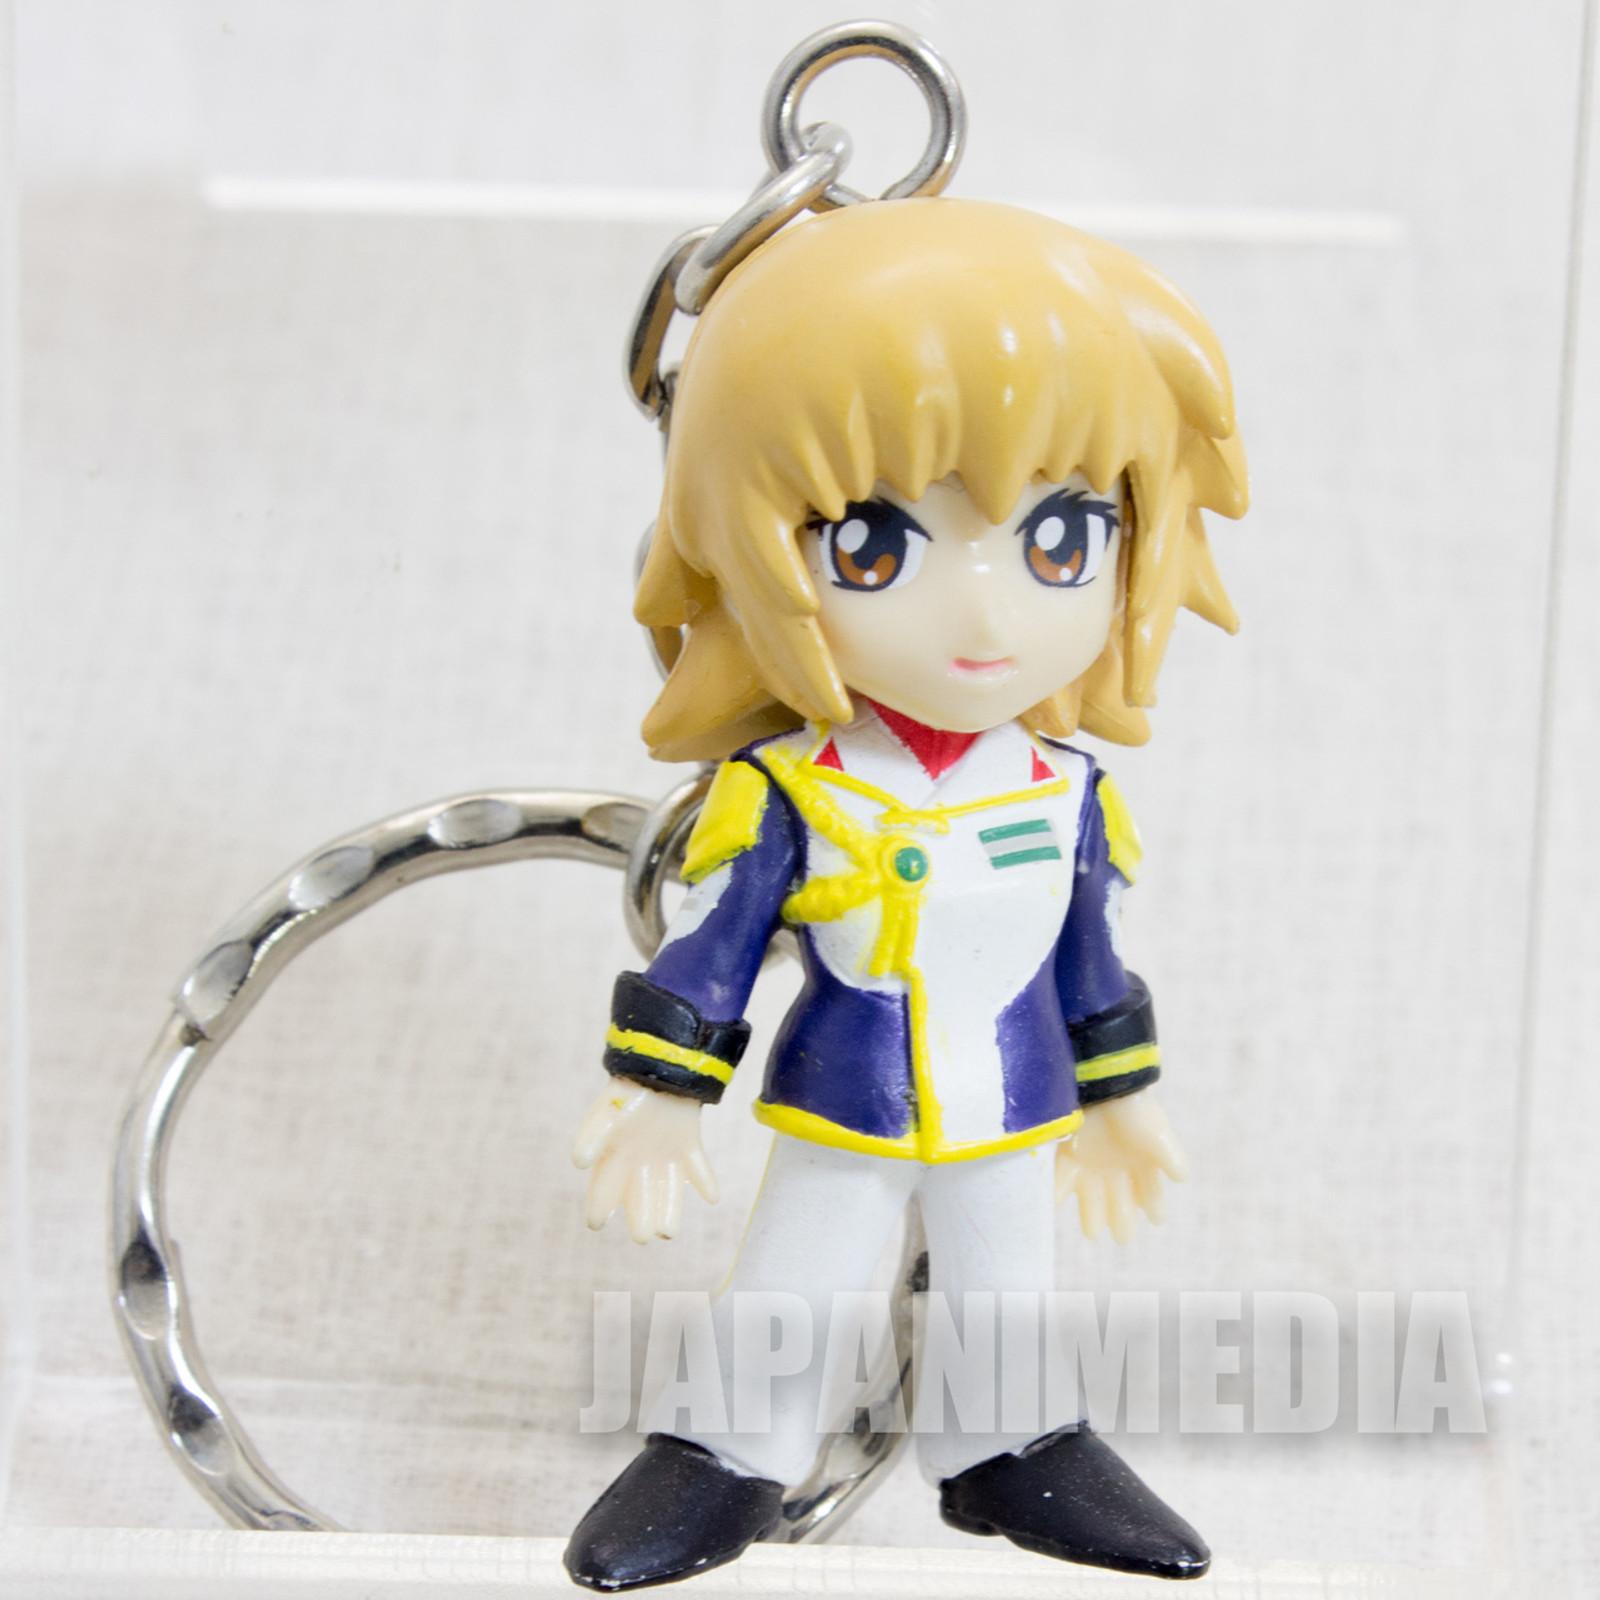 Gundam Seed Cagalli Yula Athha Figure Keychain JAPAN ANIME